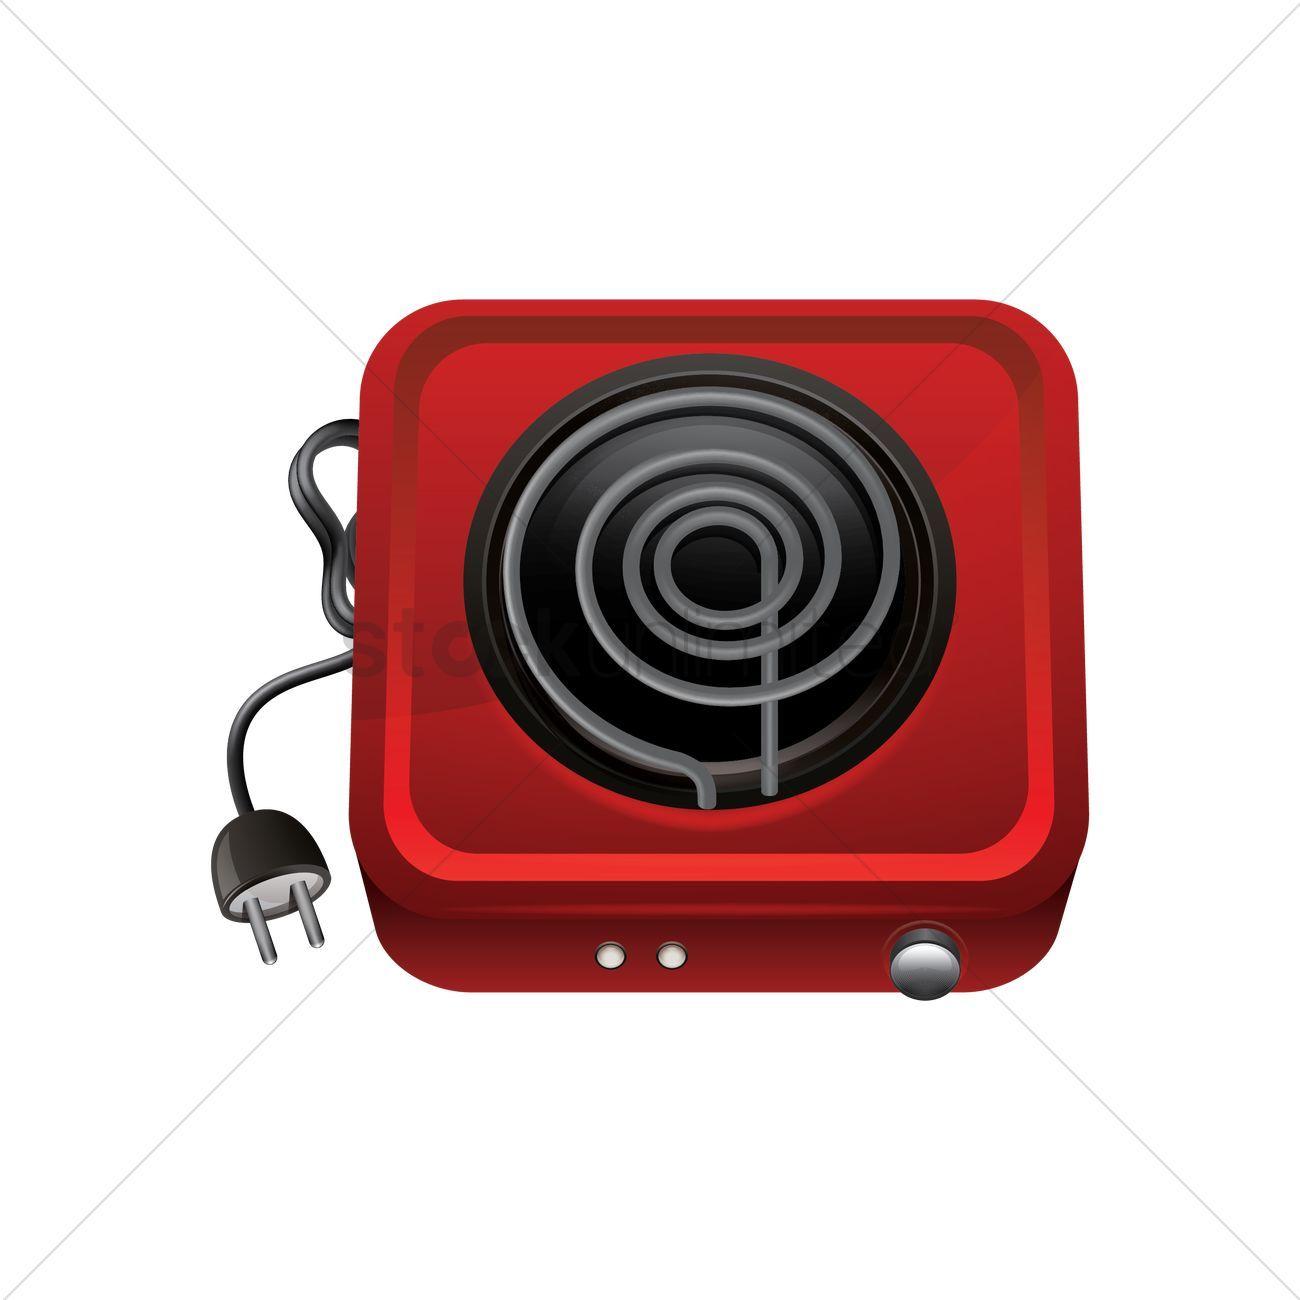 Electric stove clipart 8 » Clipart Portal.